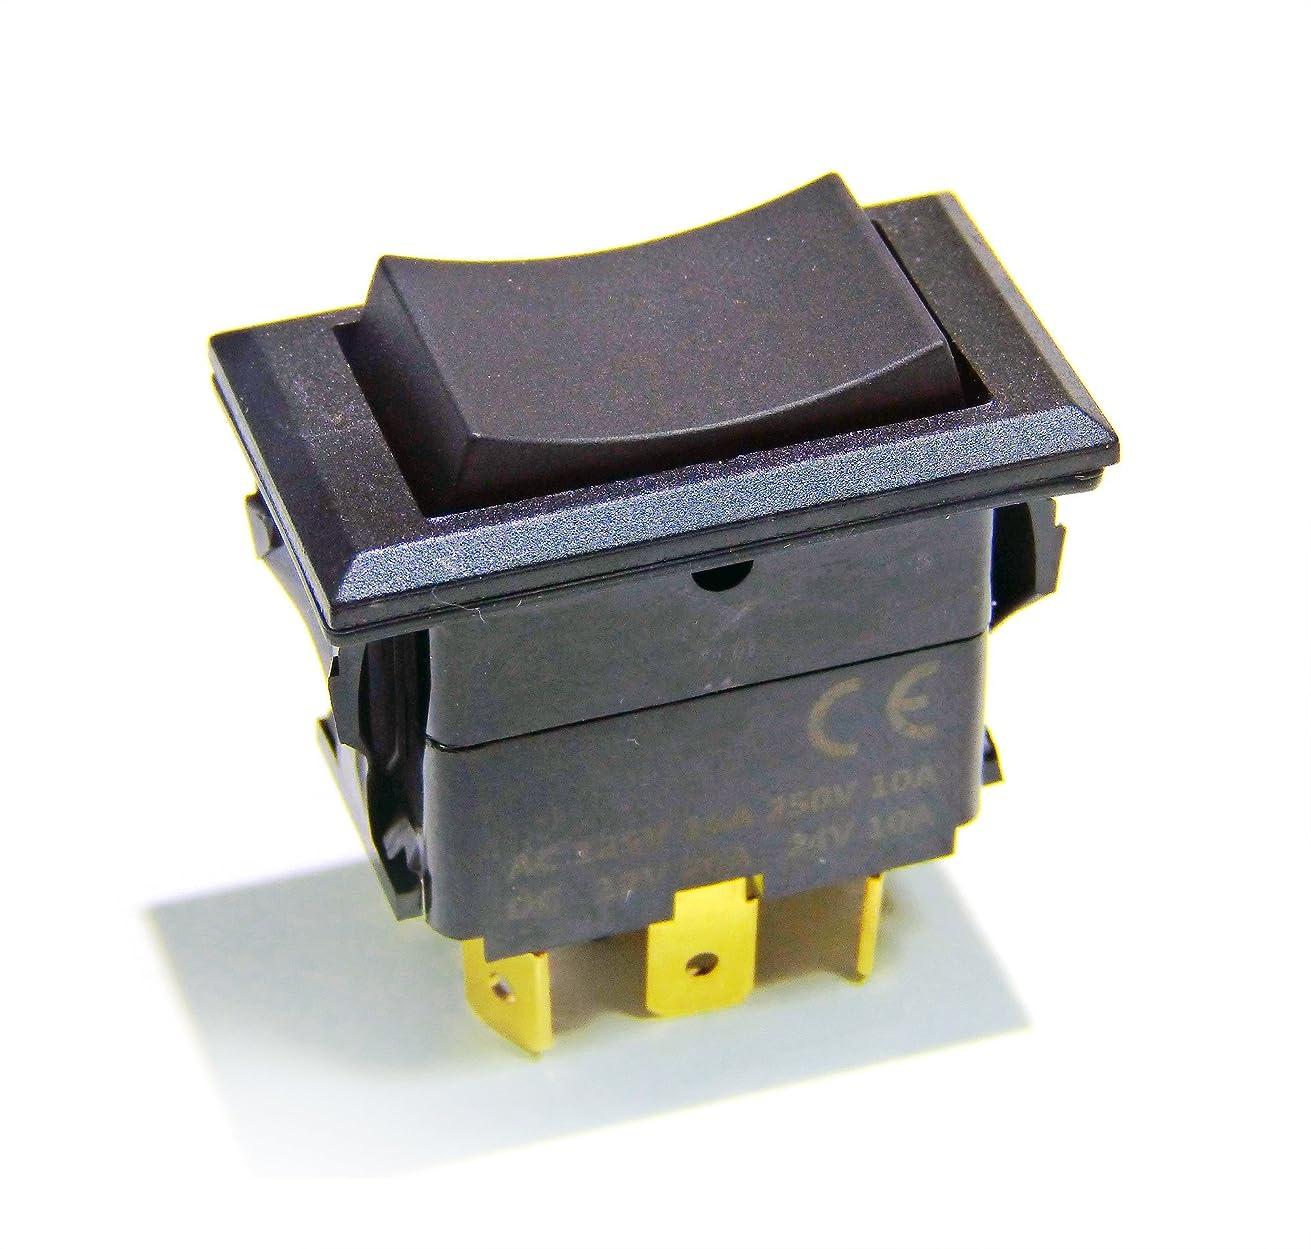 Genssi Rocker Switch On Off On Momentary Type DPDT 12V 20A or 24V 10A